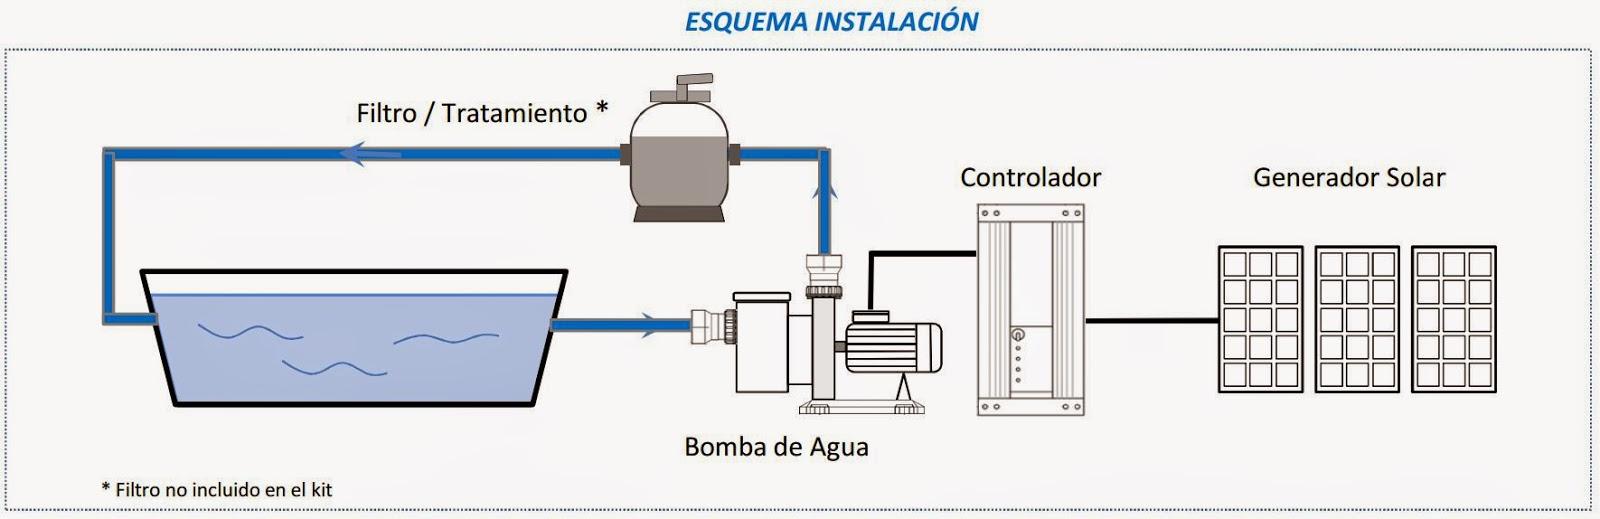 Yubasolar kits solares depuradoras de piscina - Esquema funcionamiento depuradora piscina ...